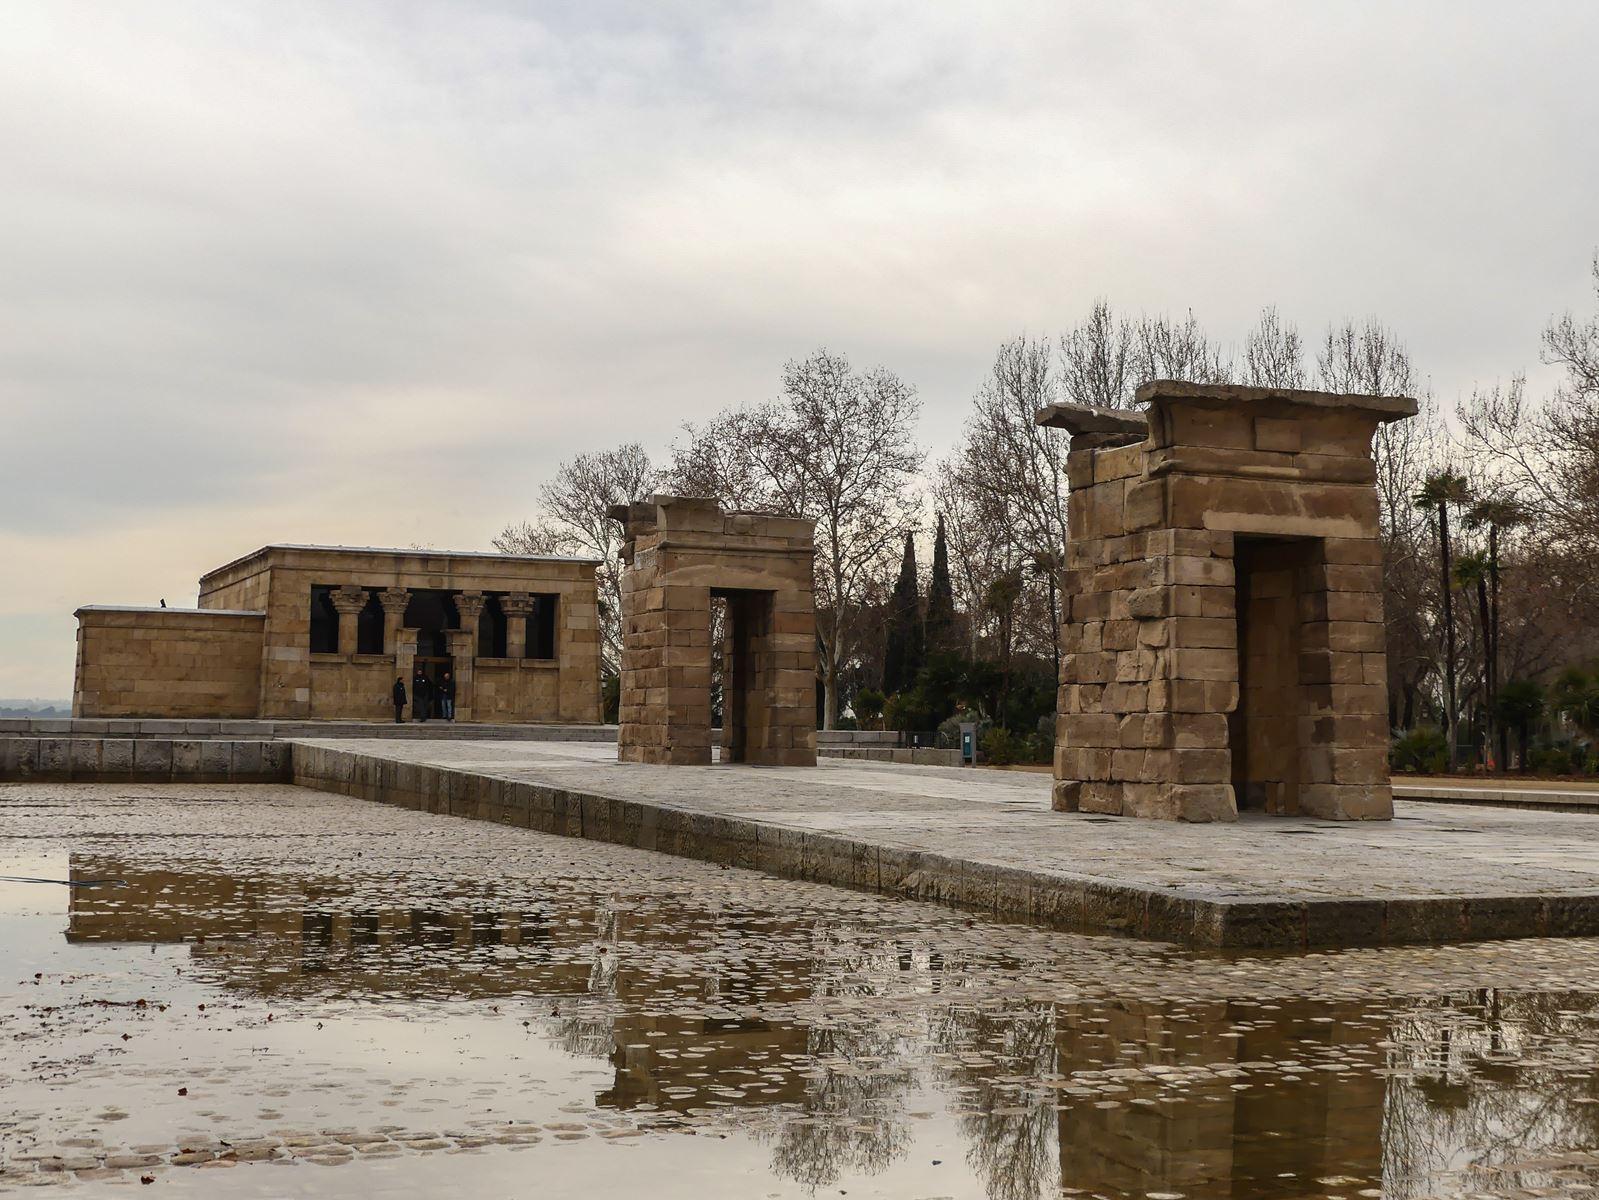 madrid-claironyva-parque de la montane - templo debod